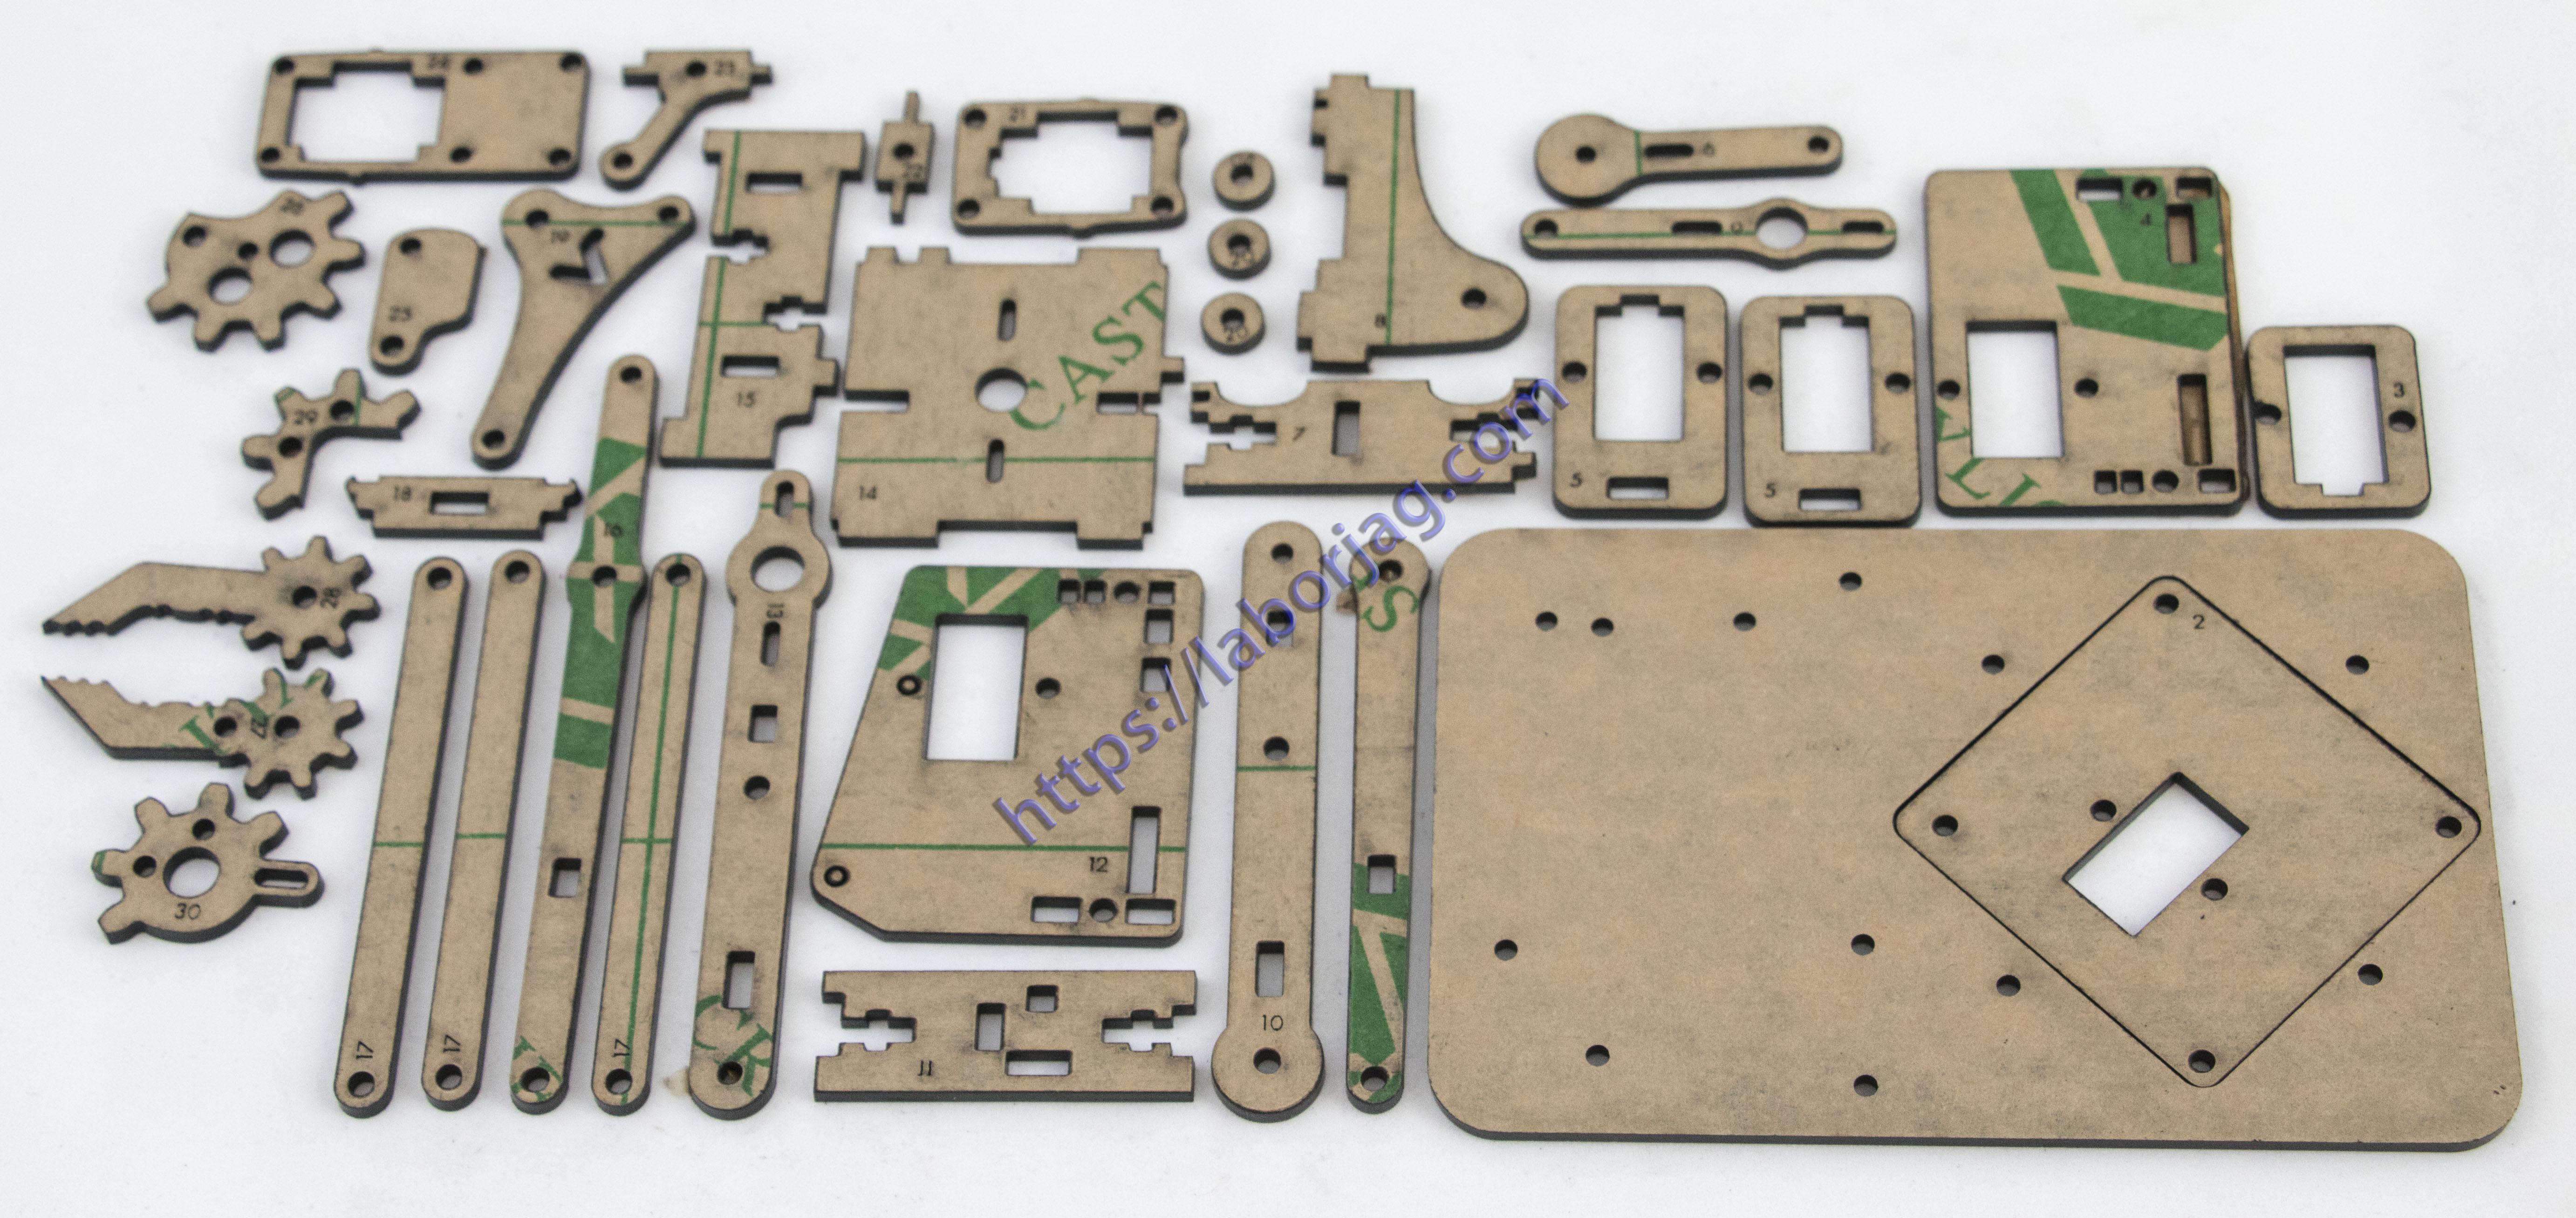 MeArm – Color Acrylic Robot Arm Plate Kit | Borja Home Page | 5529 x 2615 jpeg 1845kB